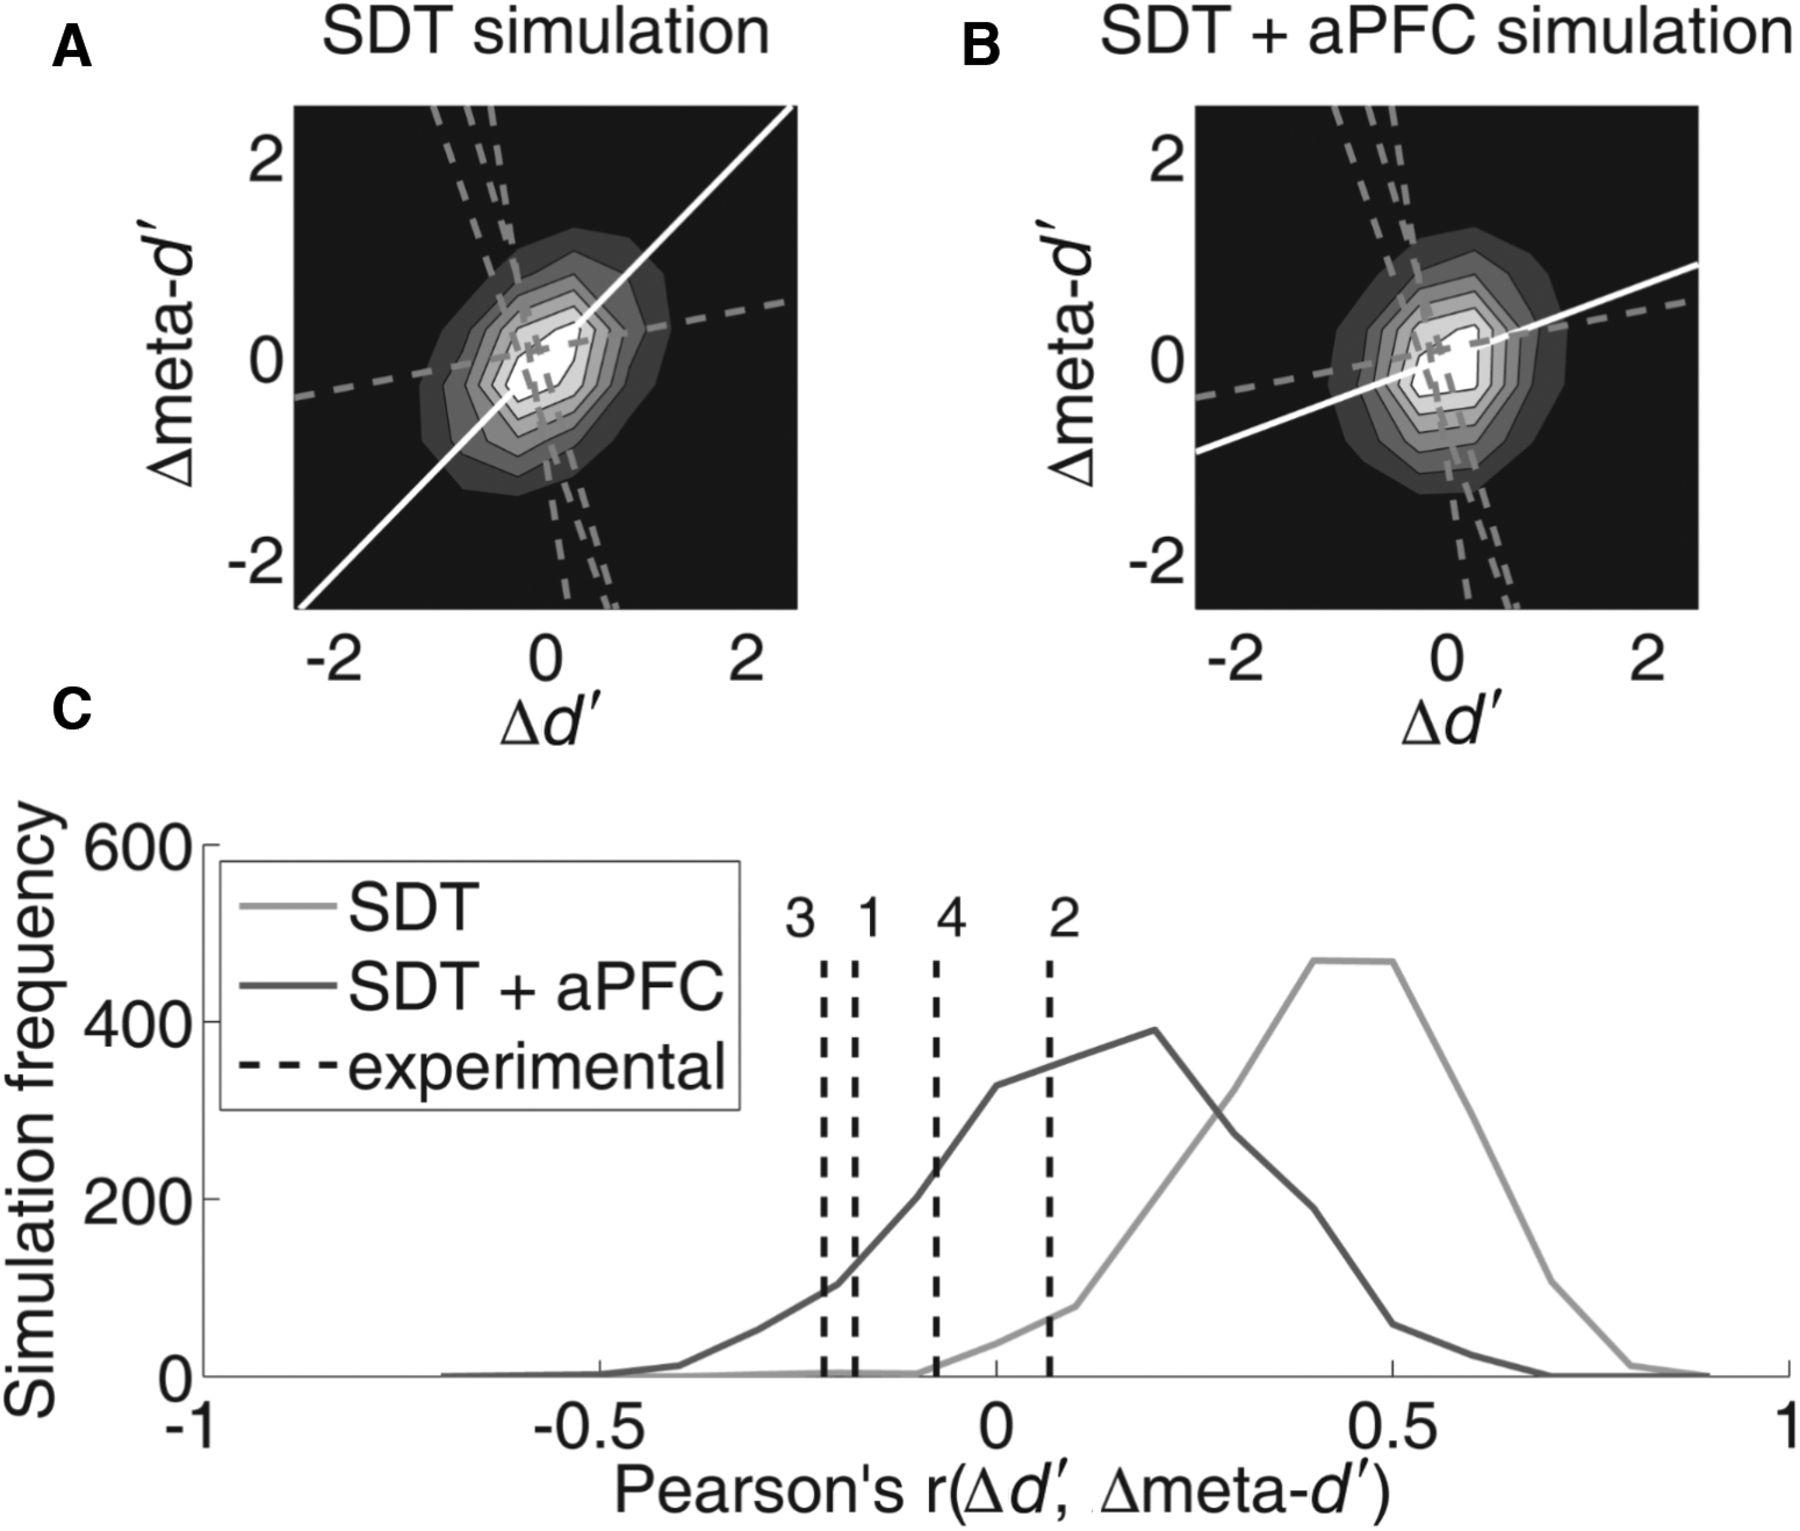 Limited Cognitive Resources Explain A Trade Off Between Perceptual